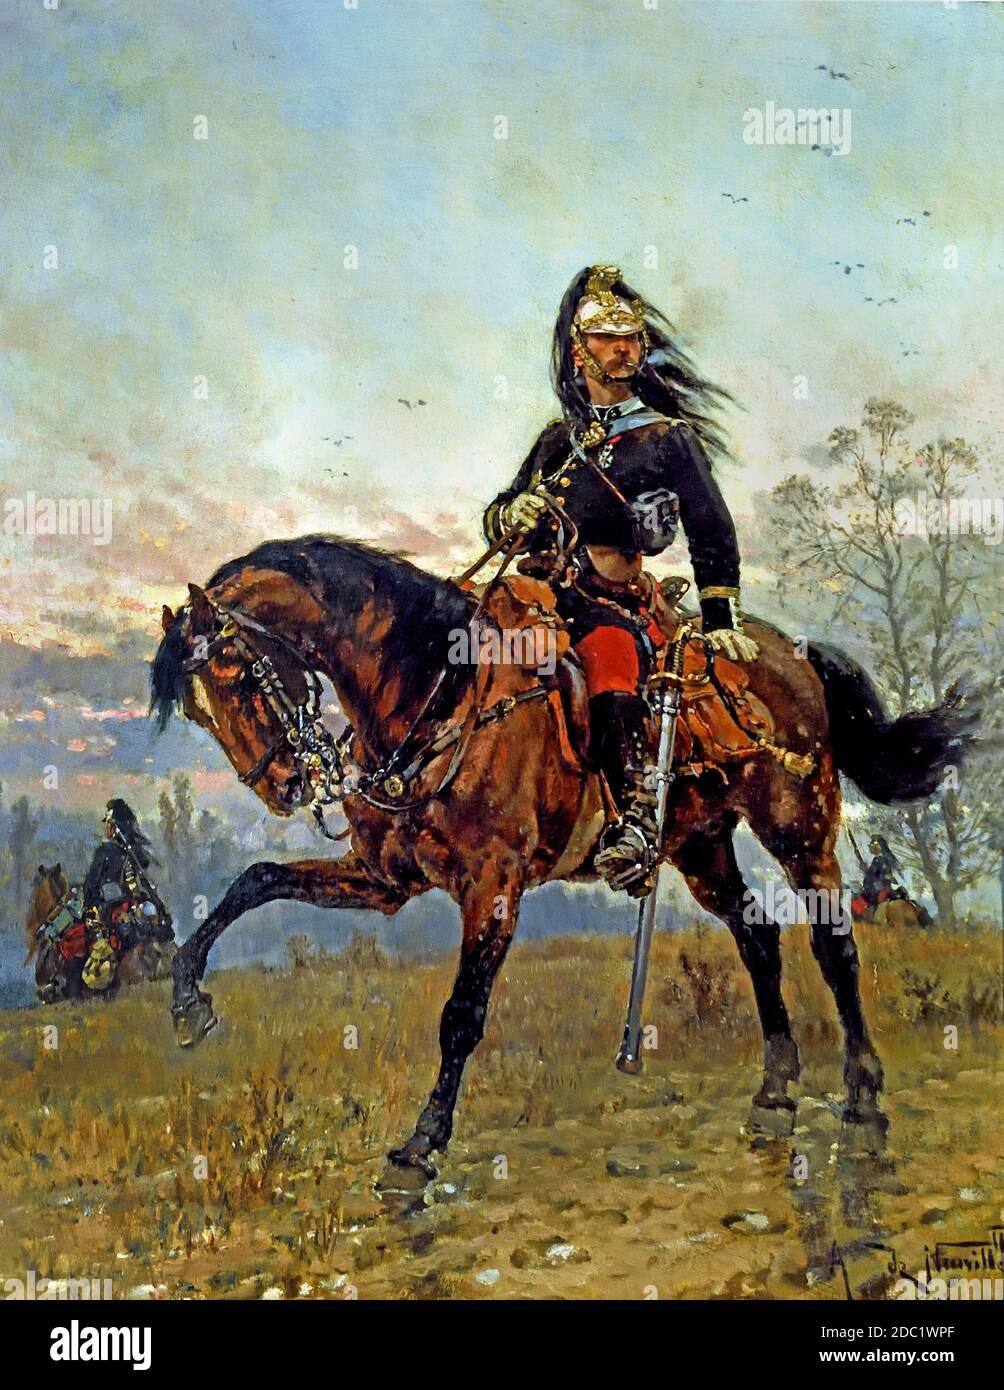 Dragones capitán 1878 Alphonse de Neuville, 1835-1885, Francia, francés, alemán, Alemania, Foto de stock